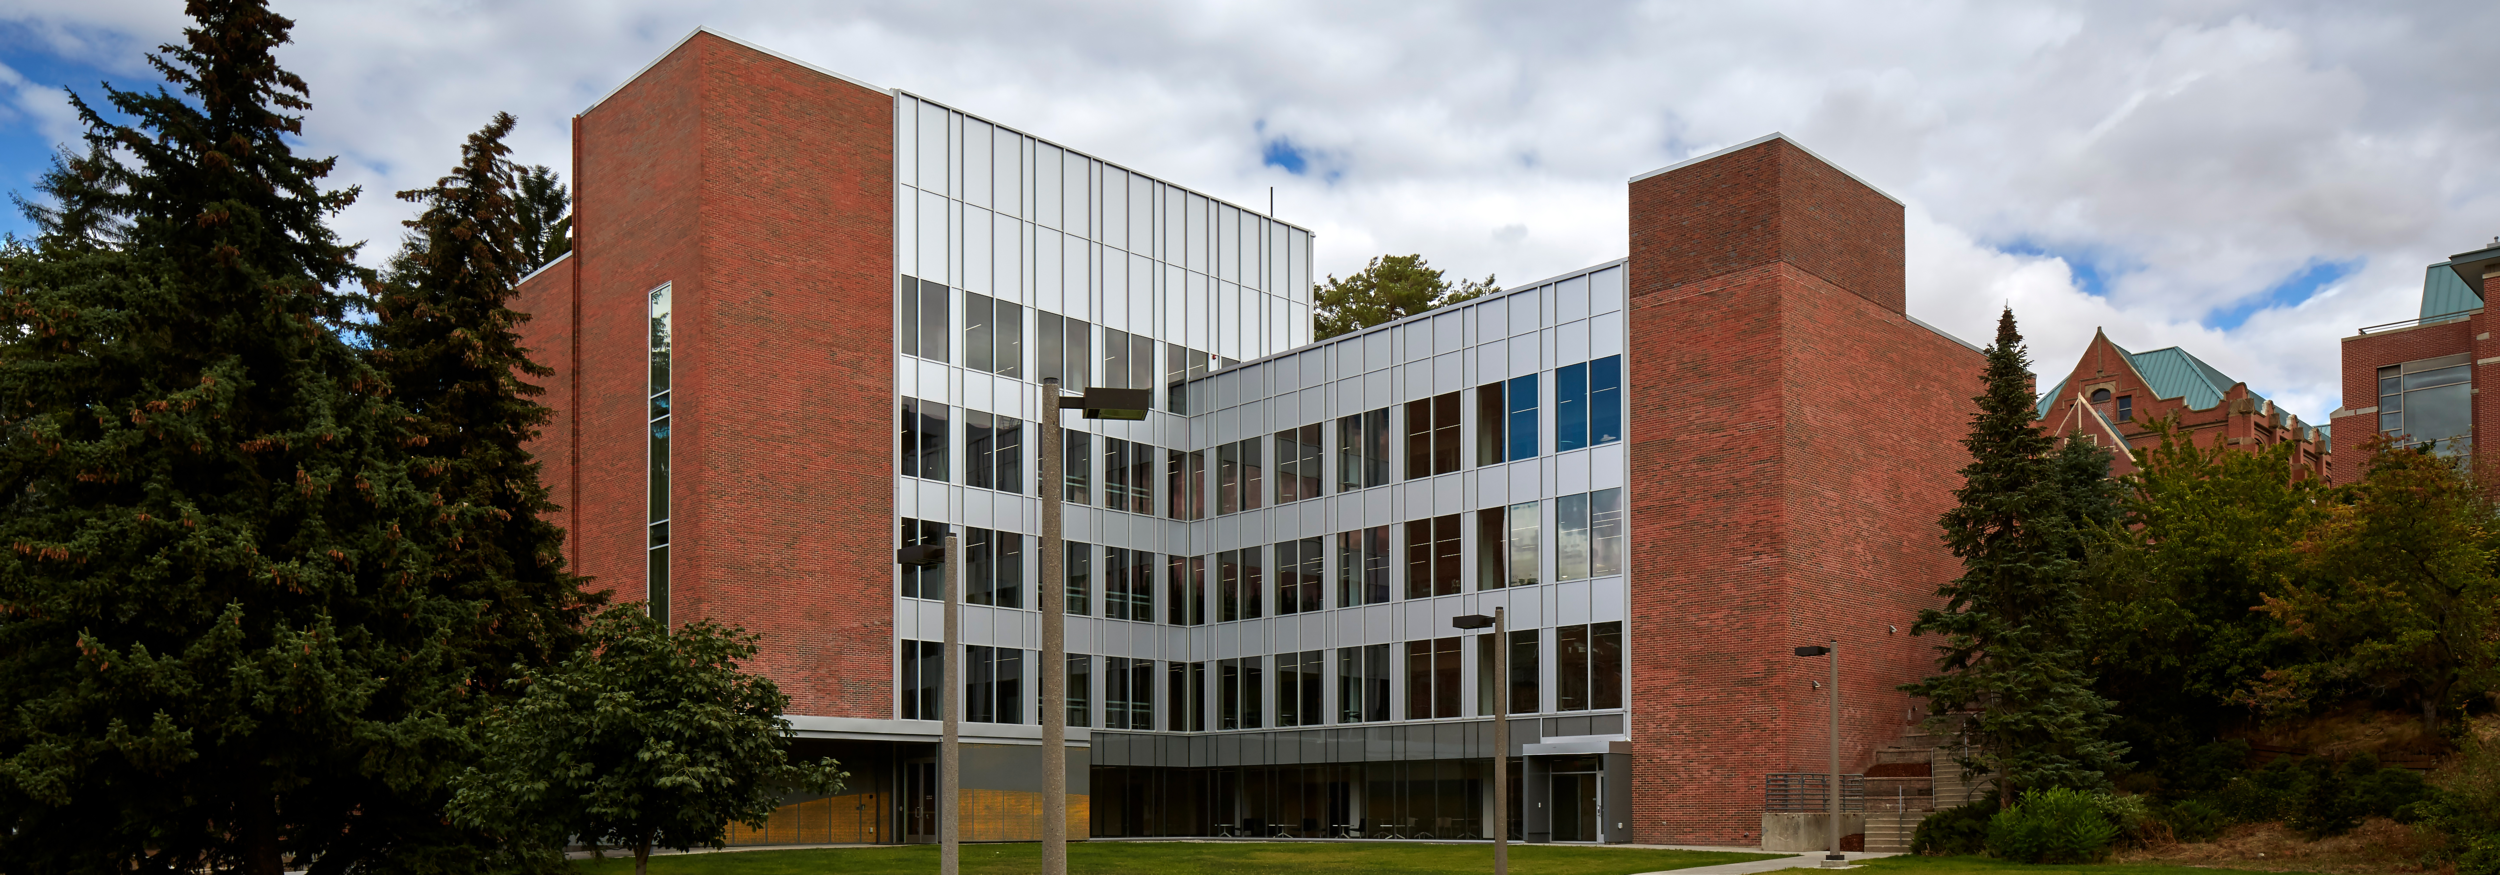 U of I Education Building